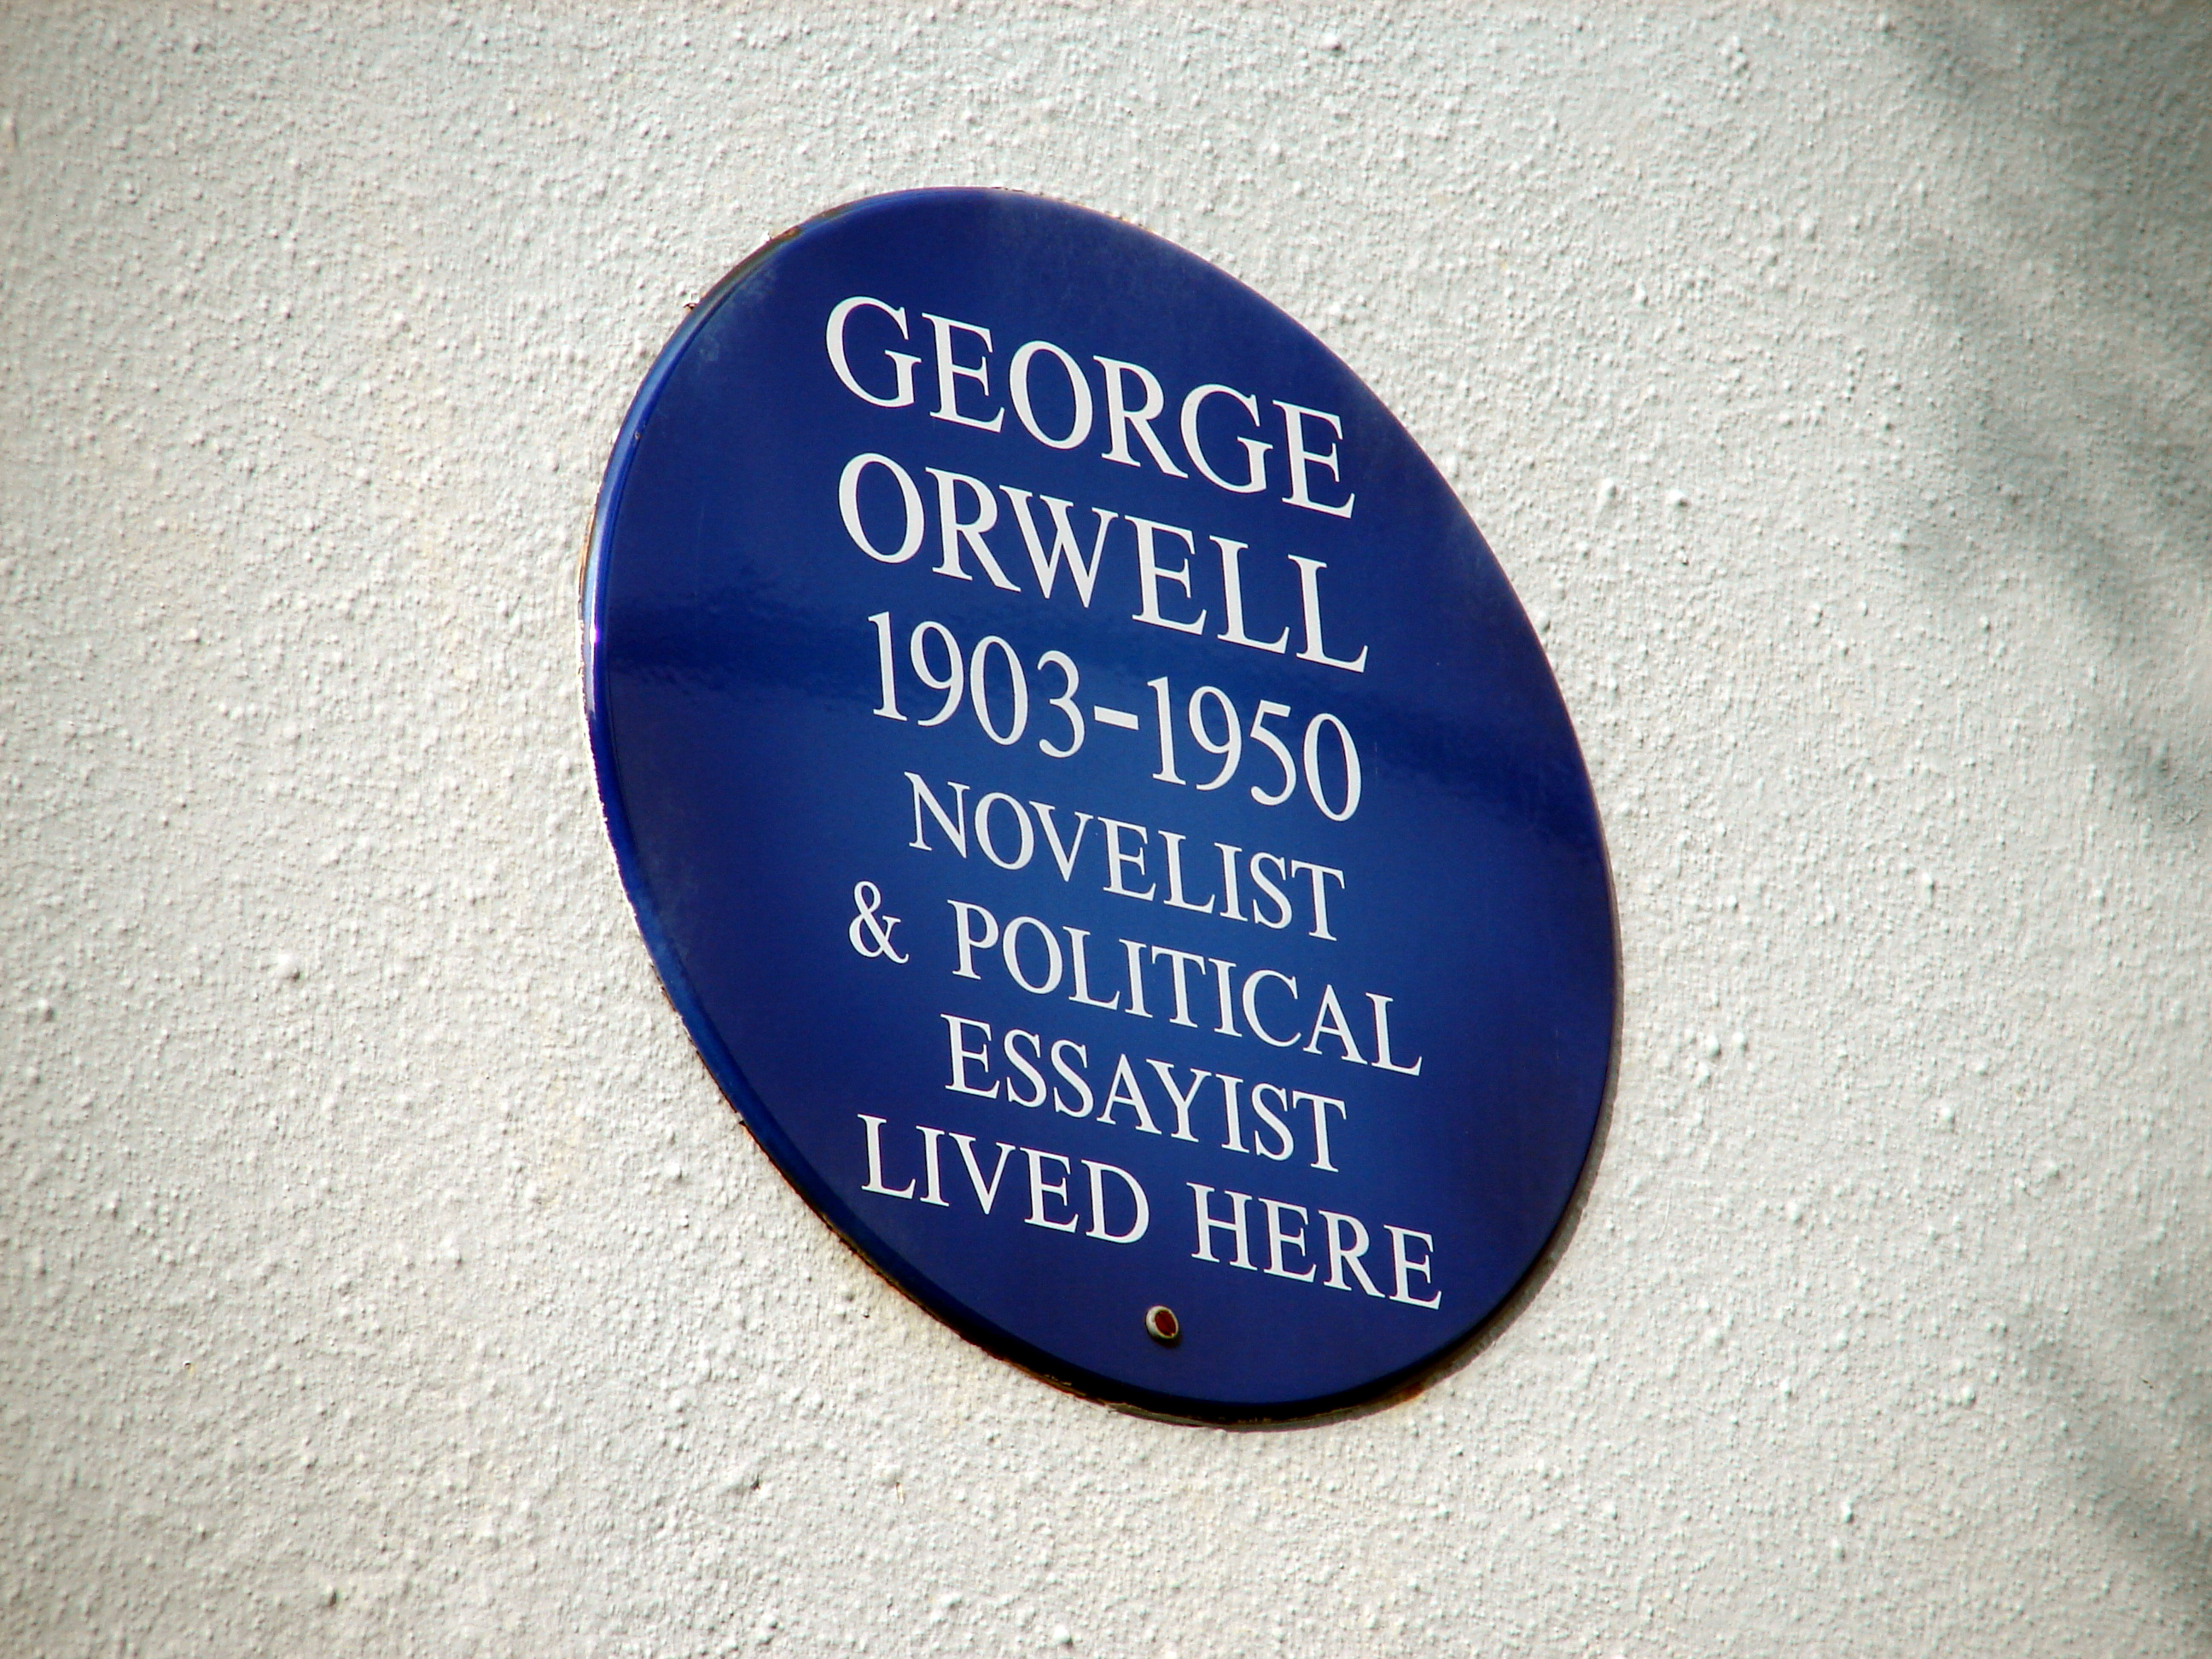 El Tópic de George Orwell - Página 4 Plaque_to_George_Orwell_at_22_Portobello_Road_%284643969489%29